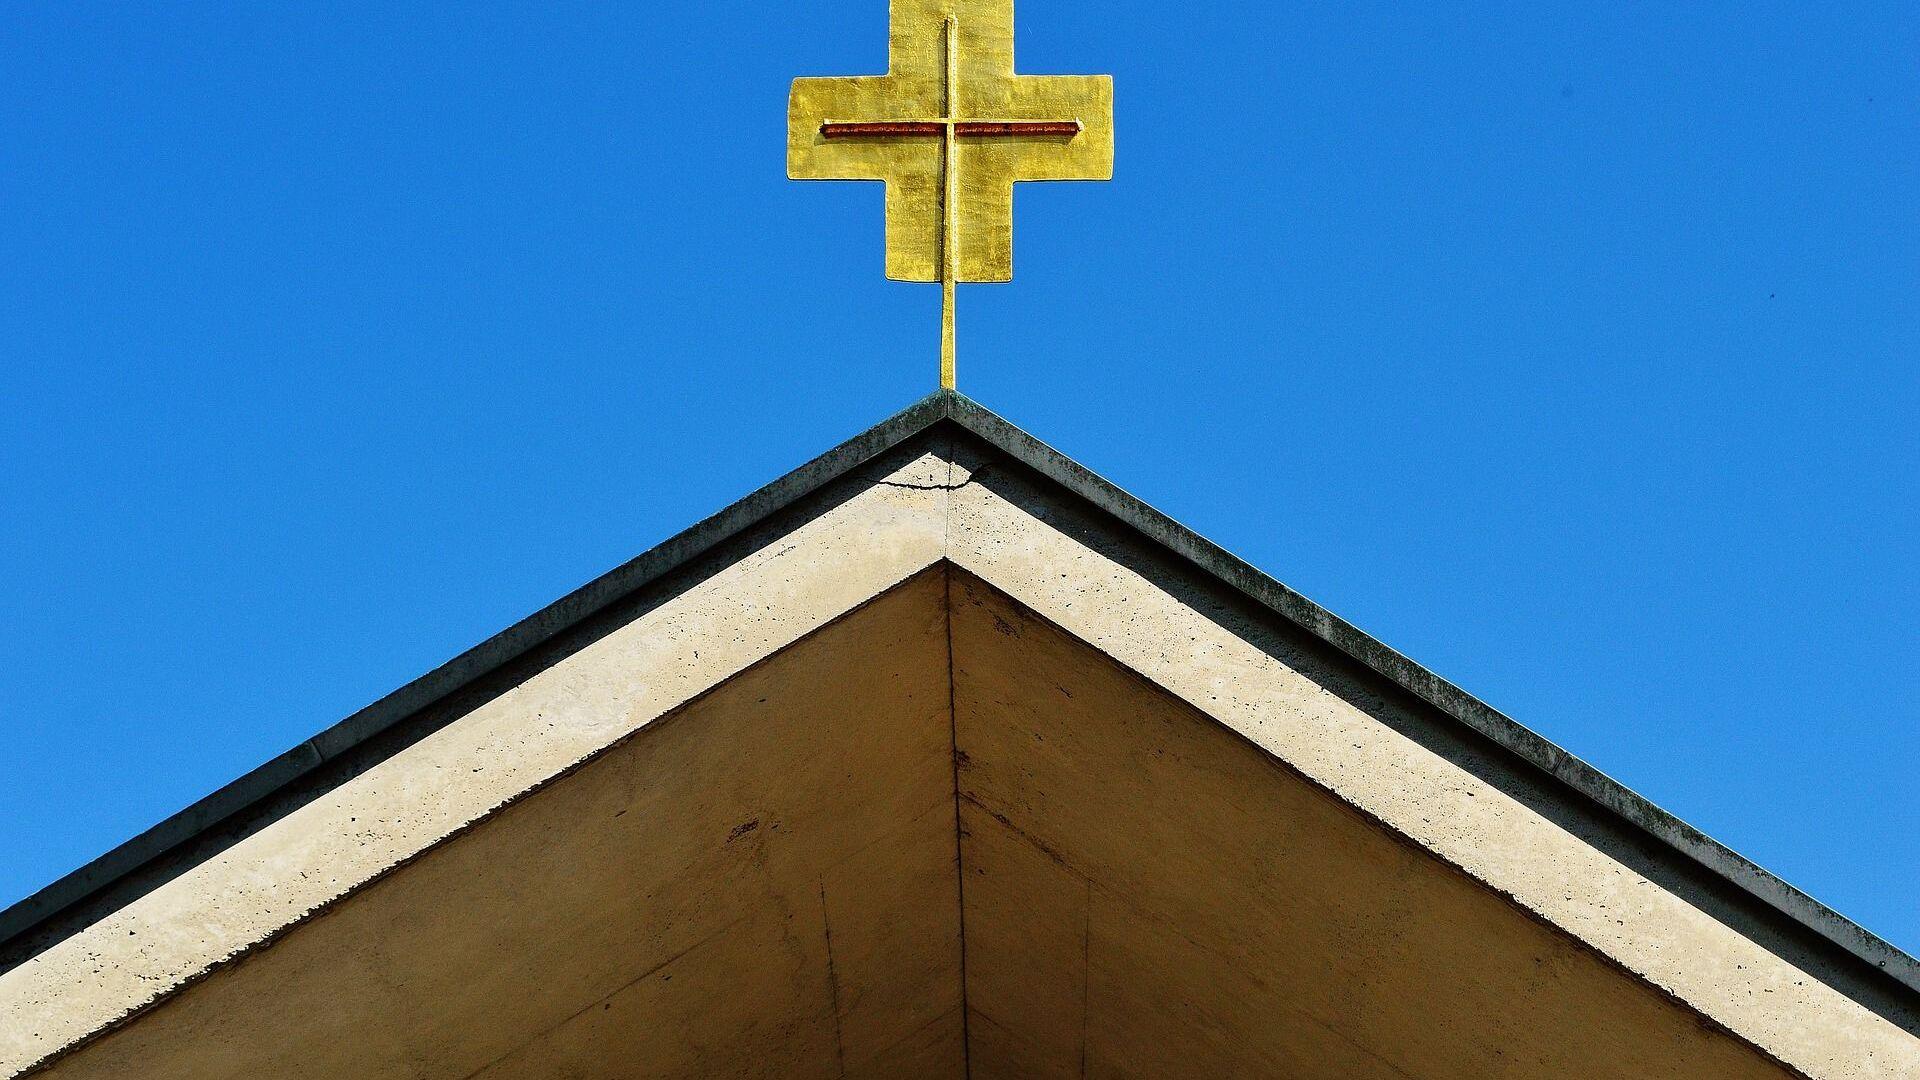 La croce di una chiesa - Sputnik Italia, 1920, 16.07.2021